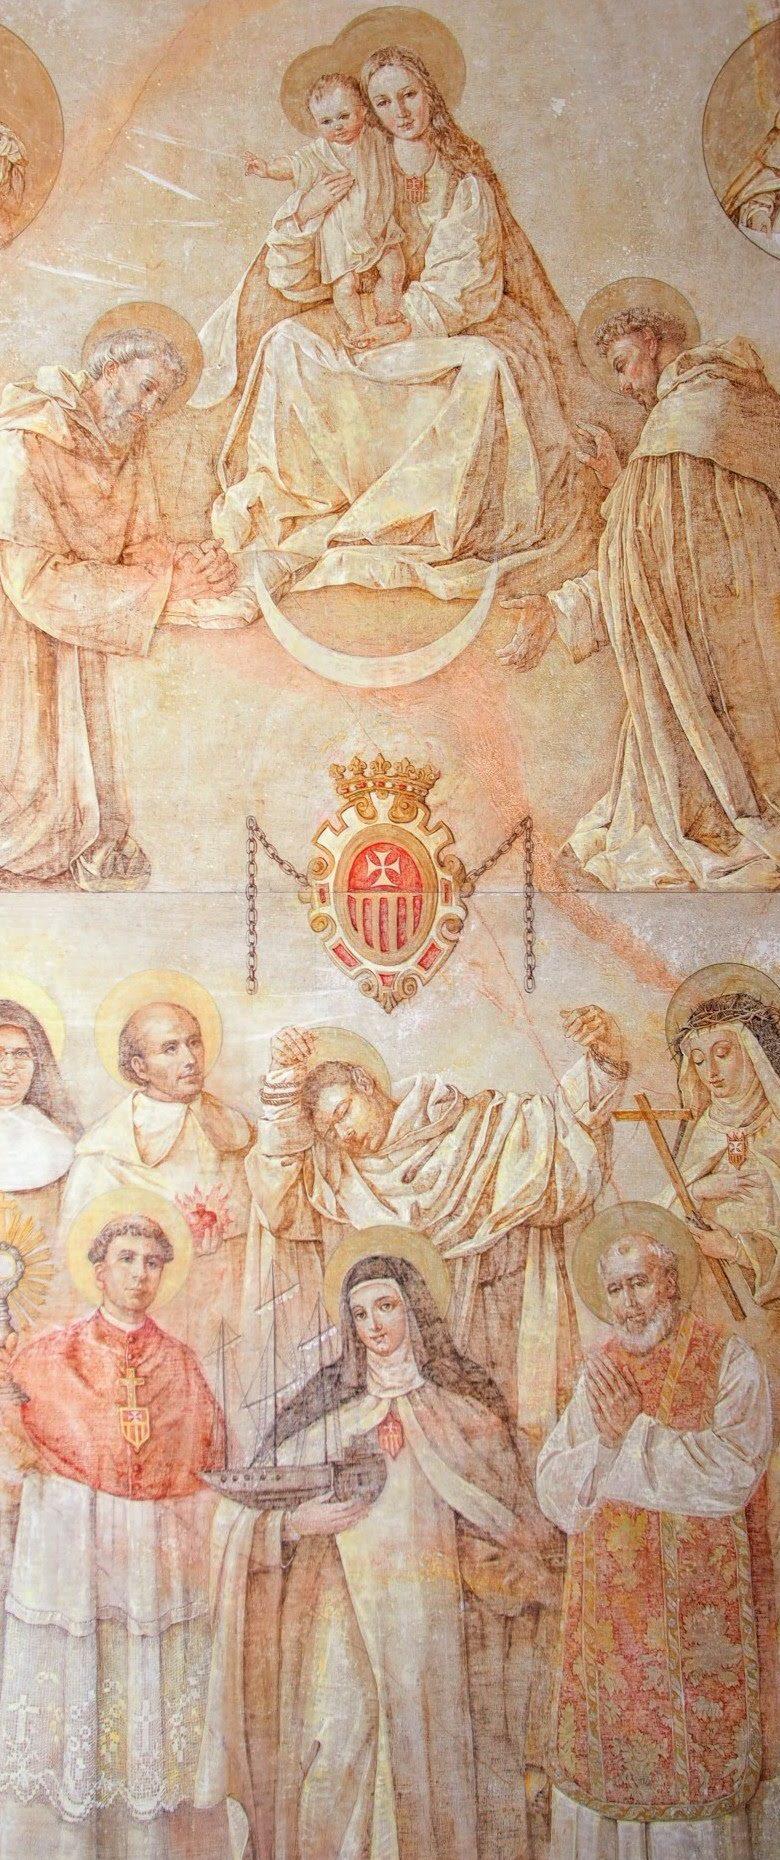 Apoteosis Mercedaria, obra de Nati Cañada en el Convento de El Olivar, Teruel, España